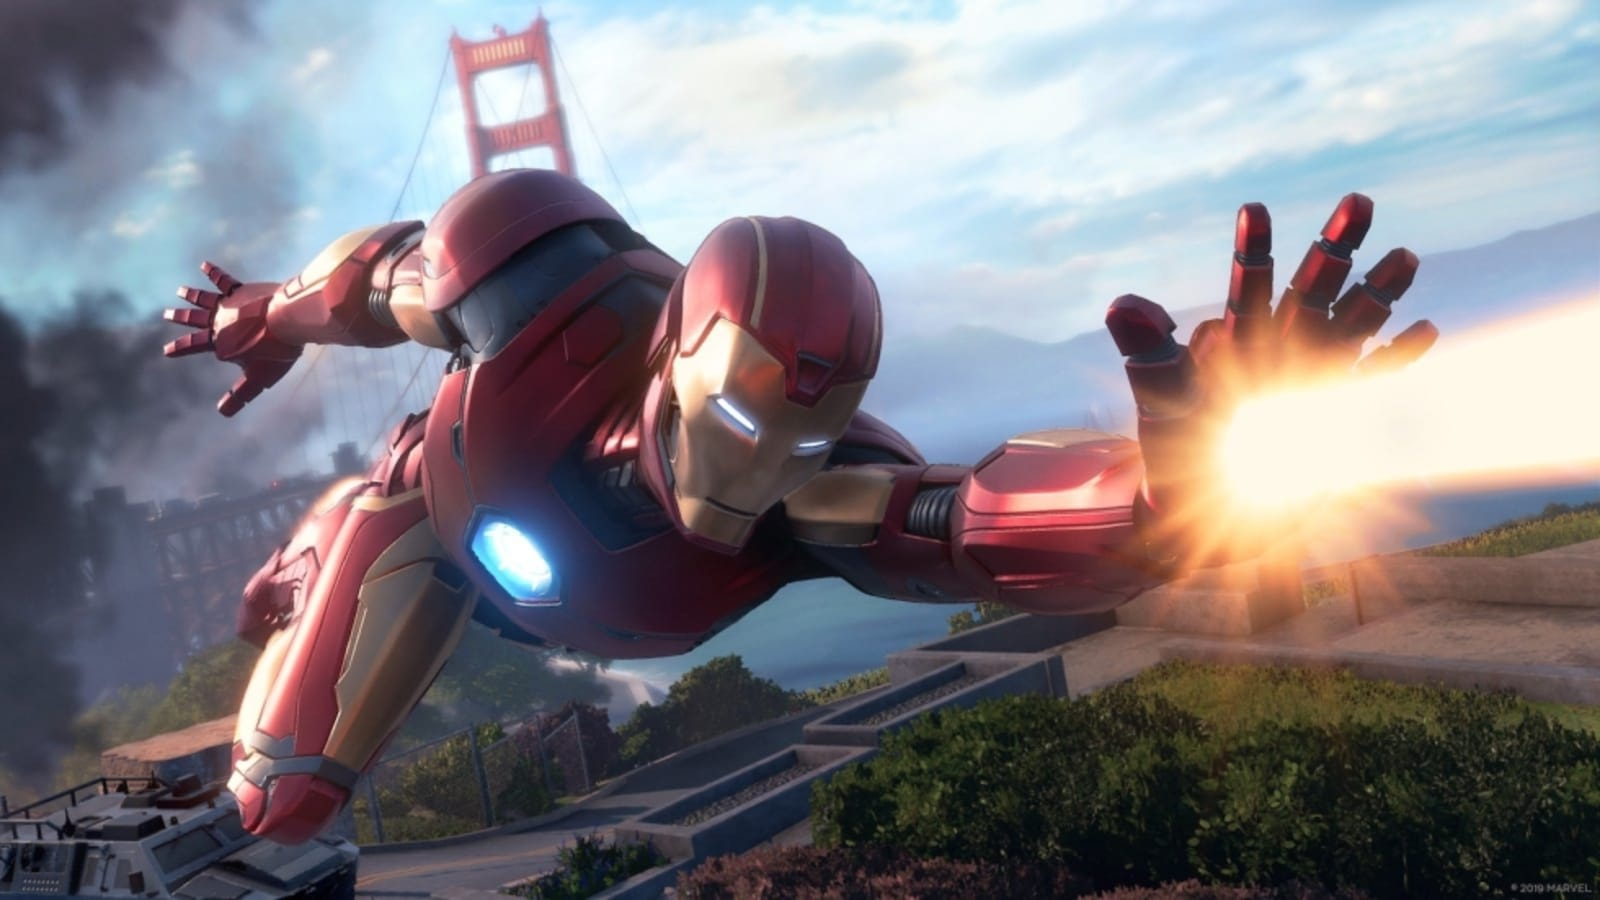 Marvels Avengers Game Is Delayed Until September 4th